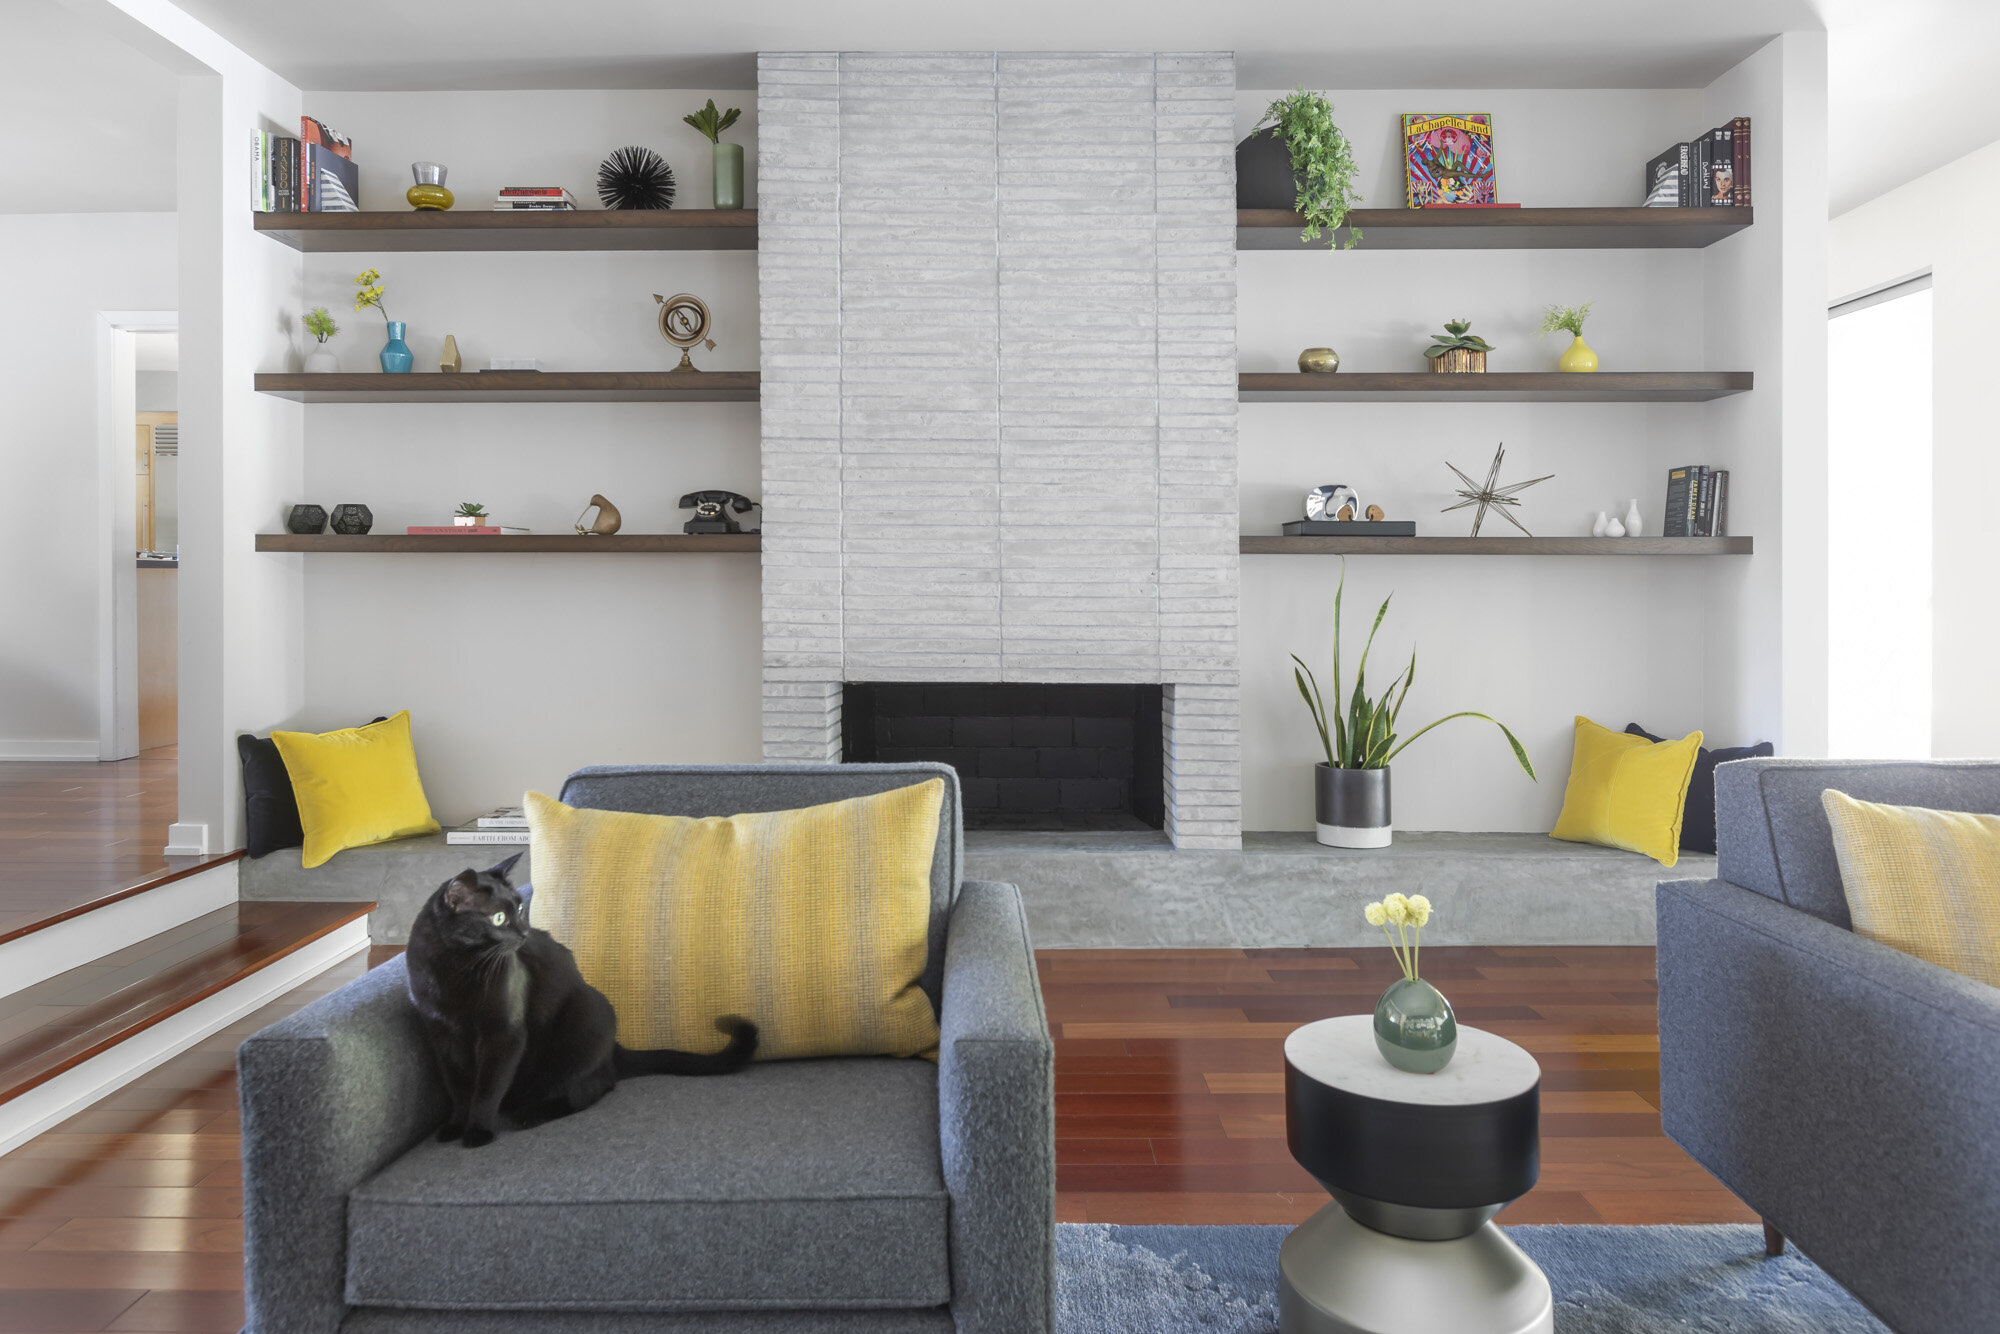 Encino-Fireplace-Newport-Brick-Early-Gray-Limestone-01.jpg